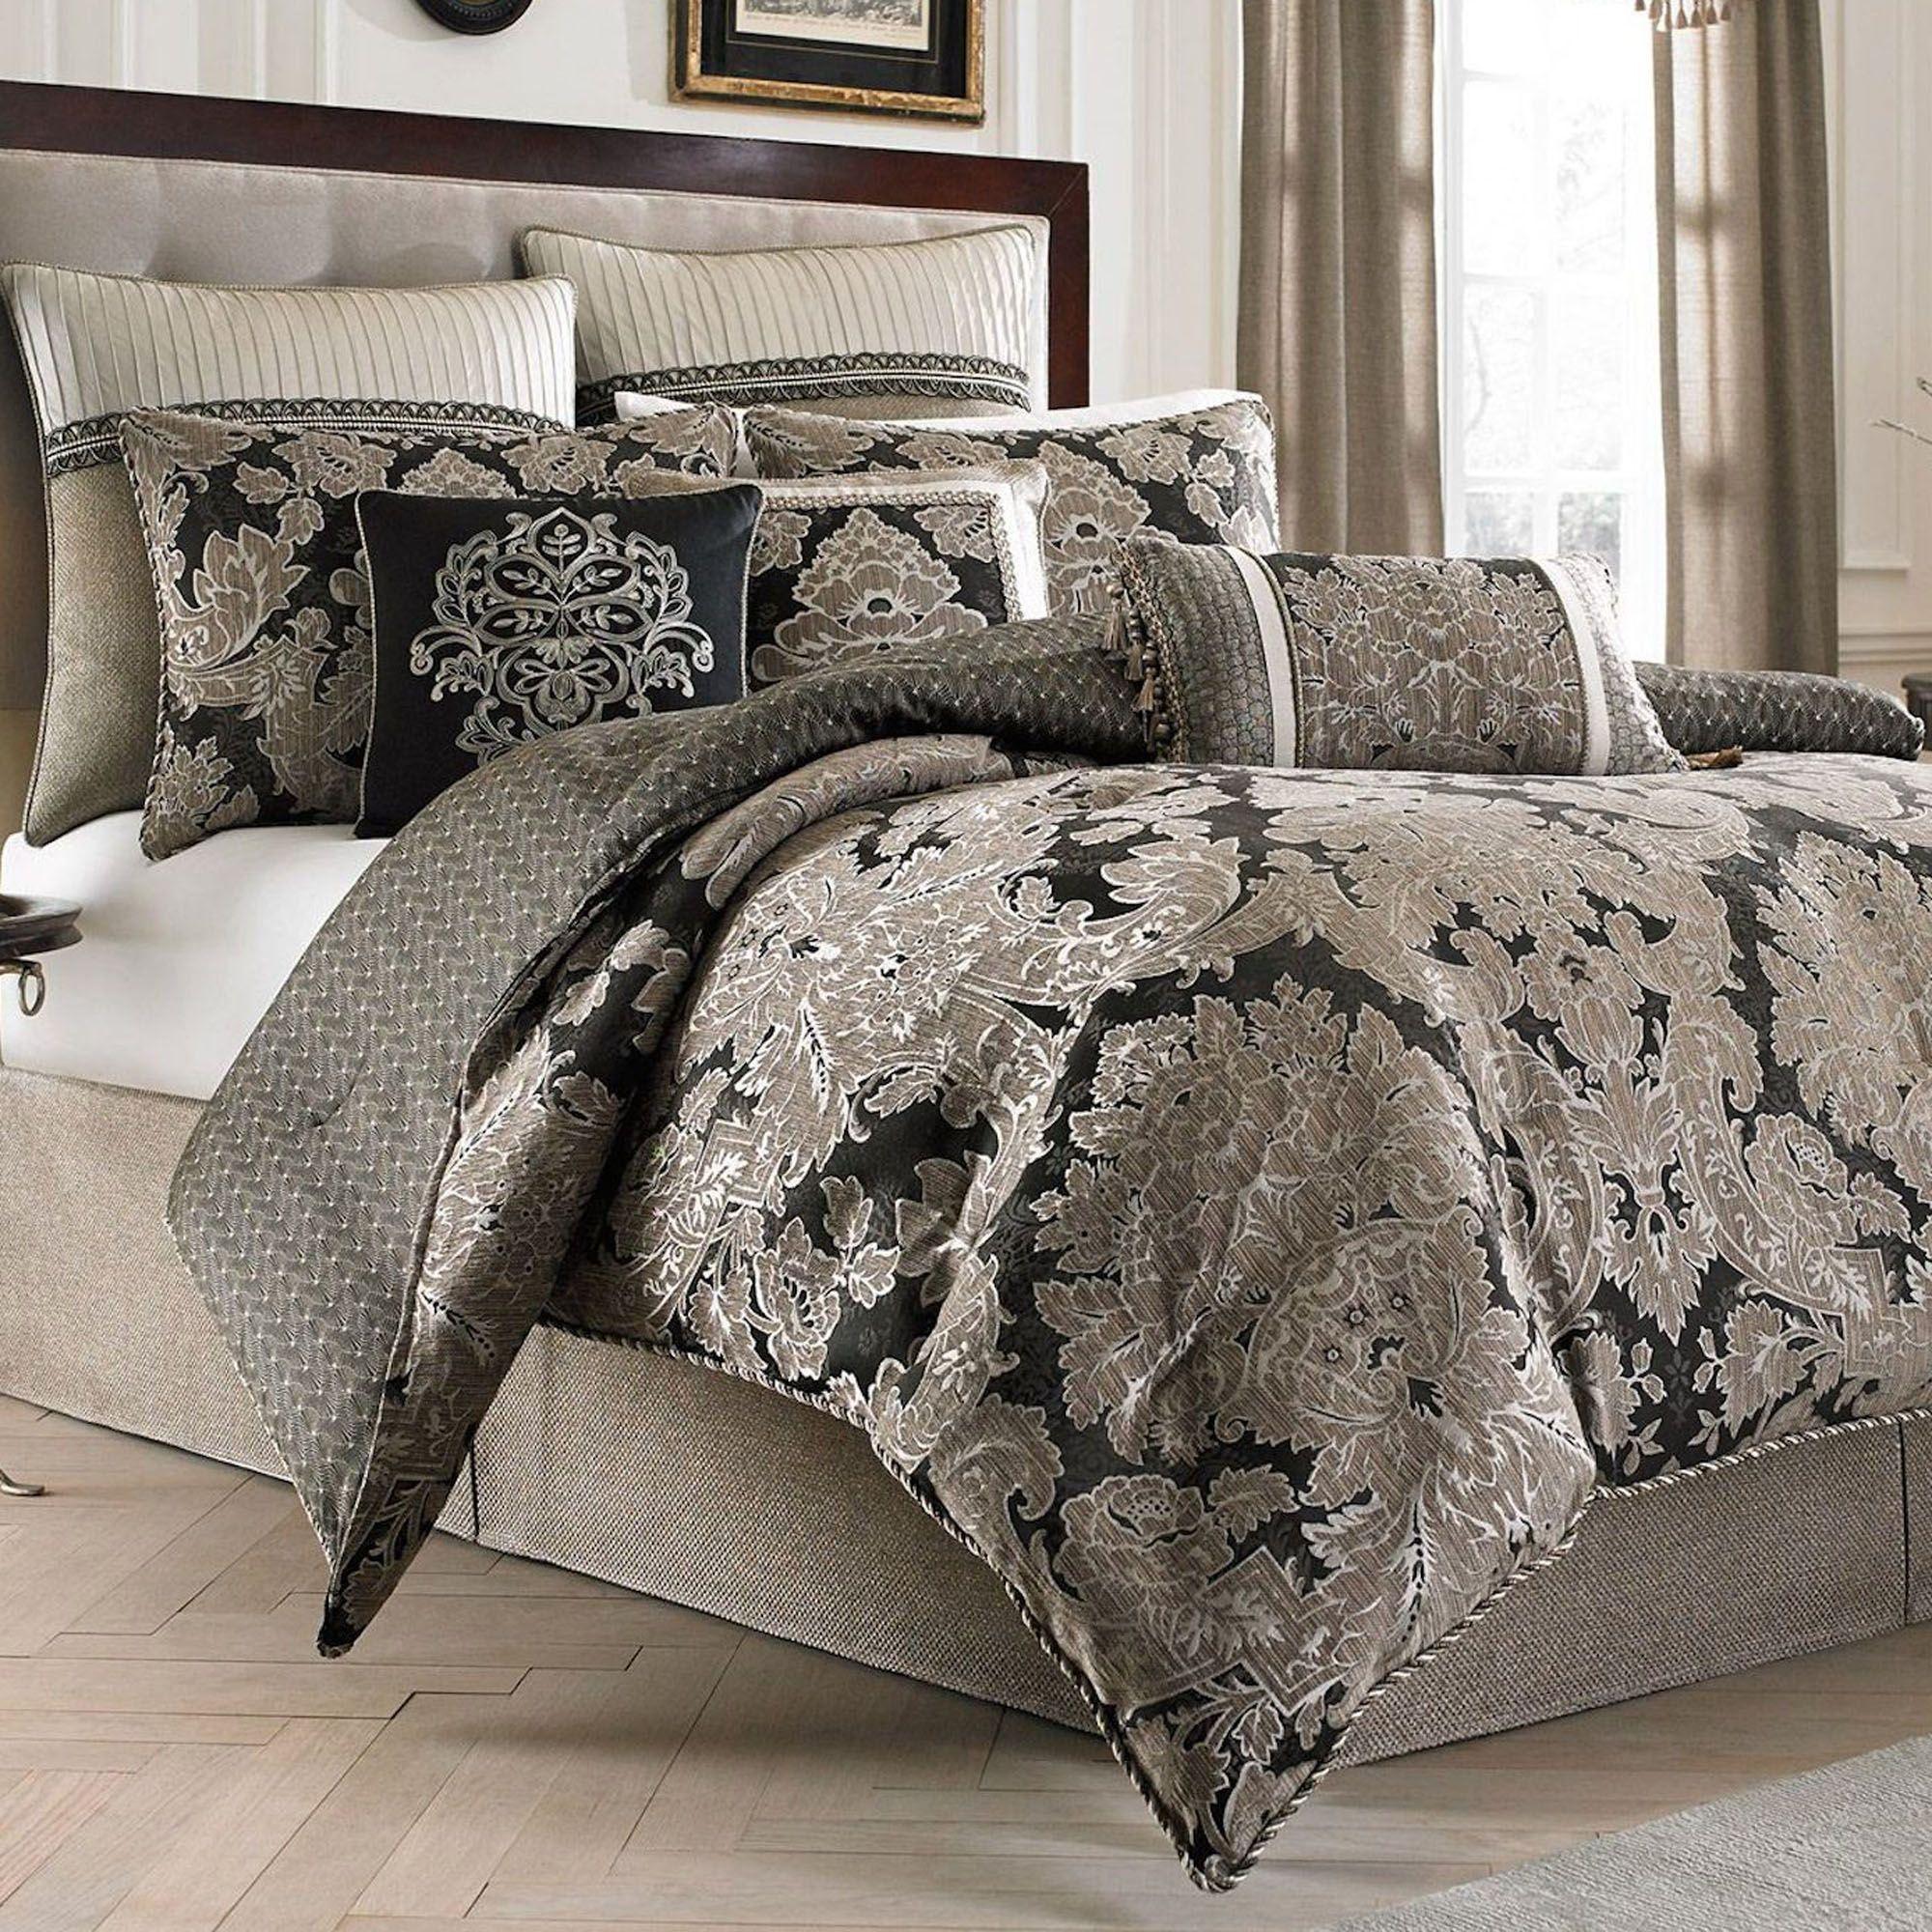 today piece bath set bedding product comforter overstock aurelio croscill sets shipping free